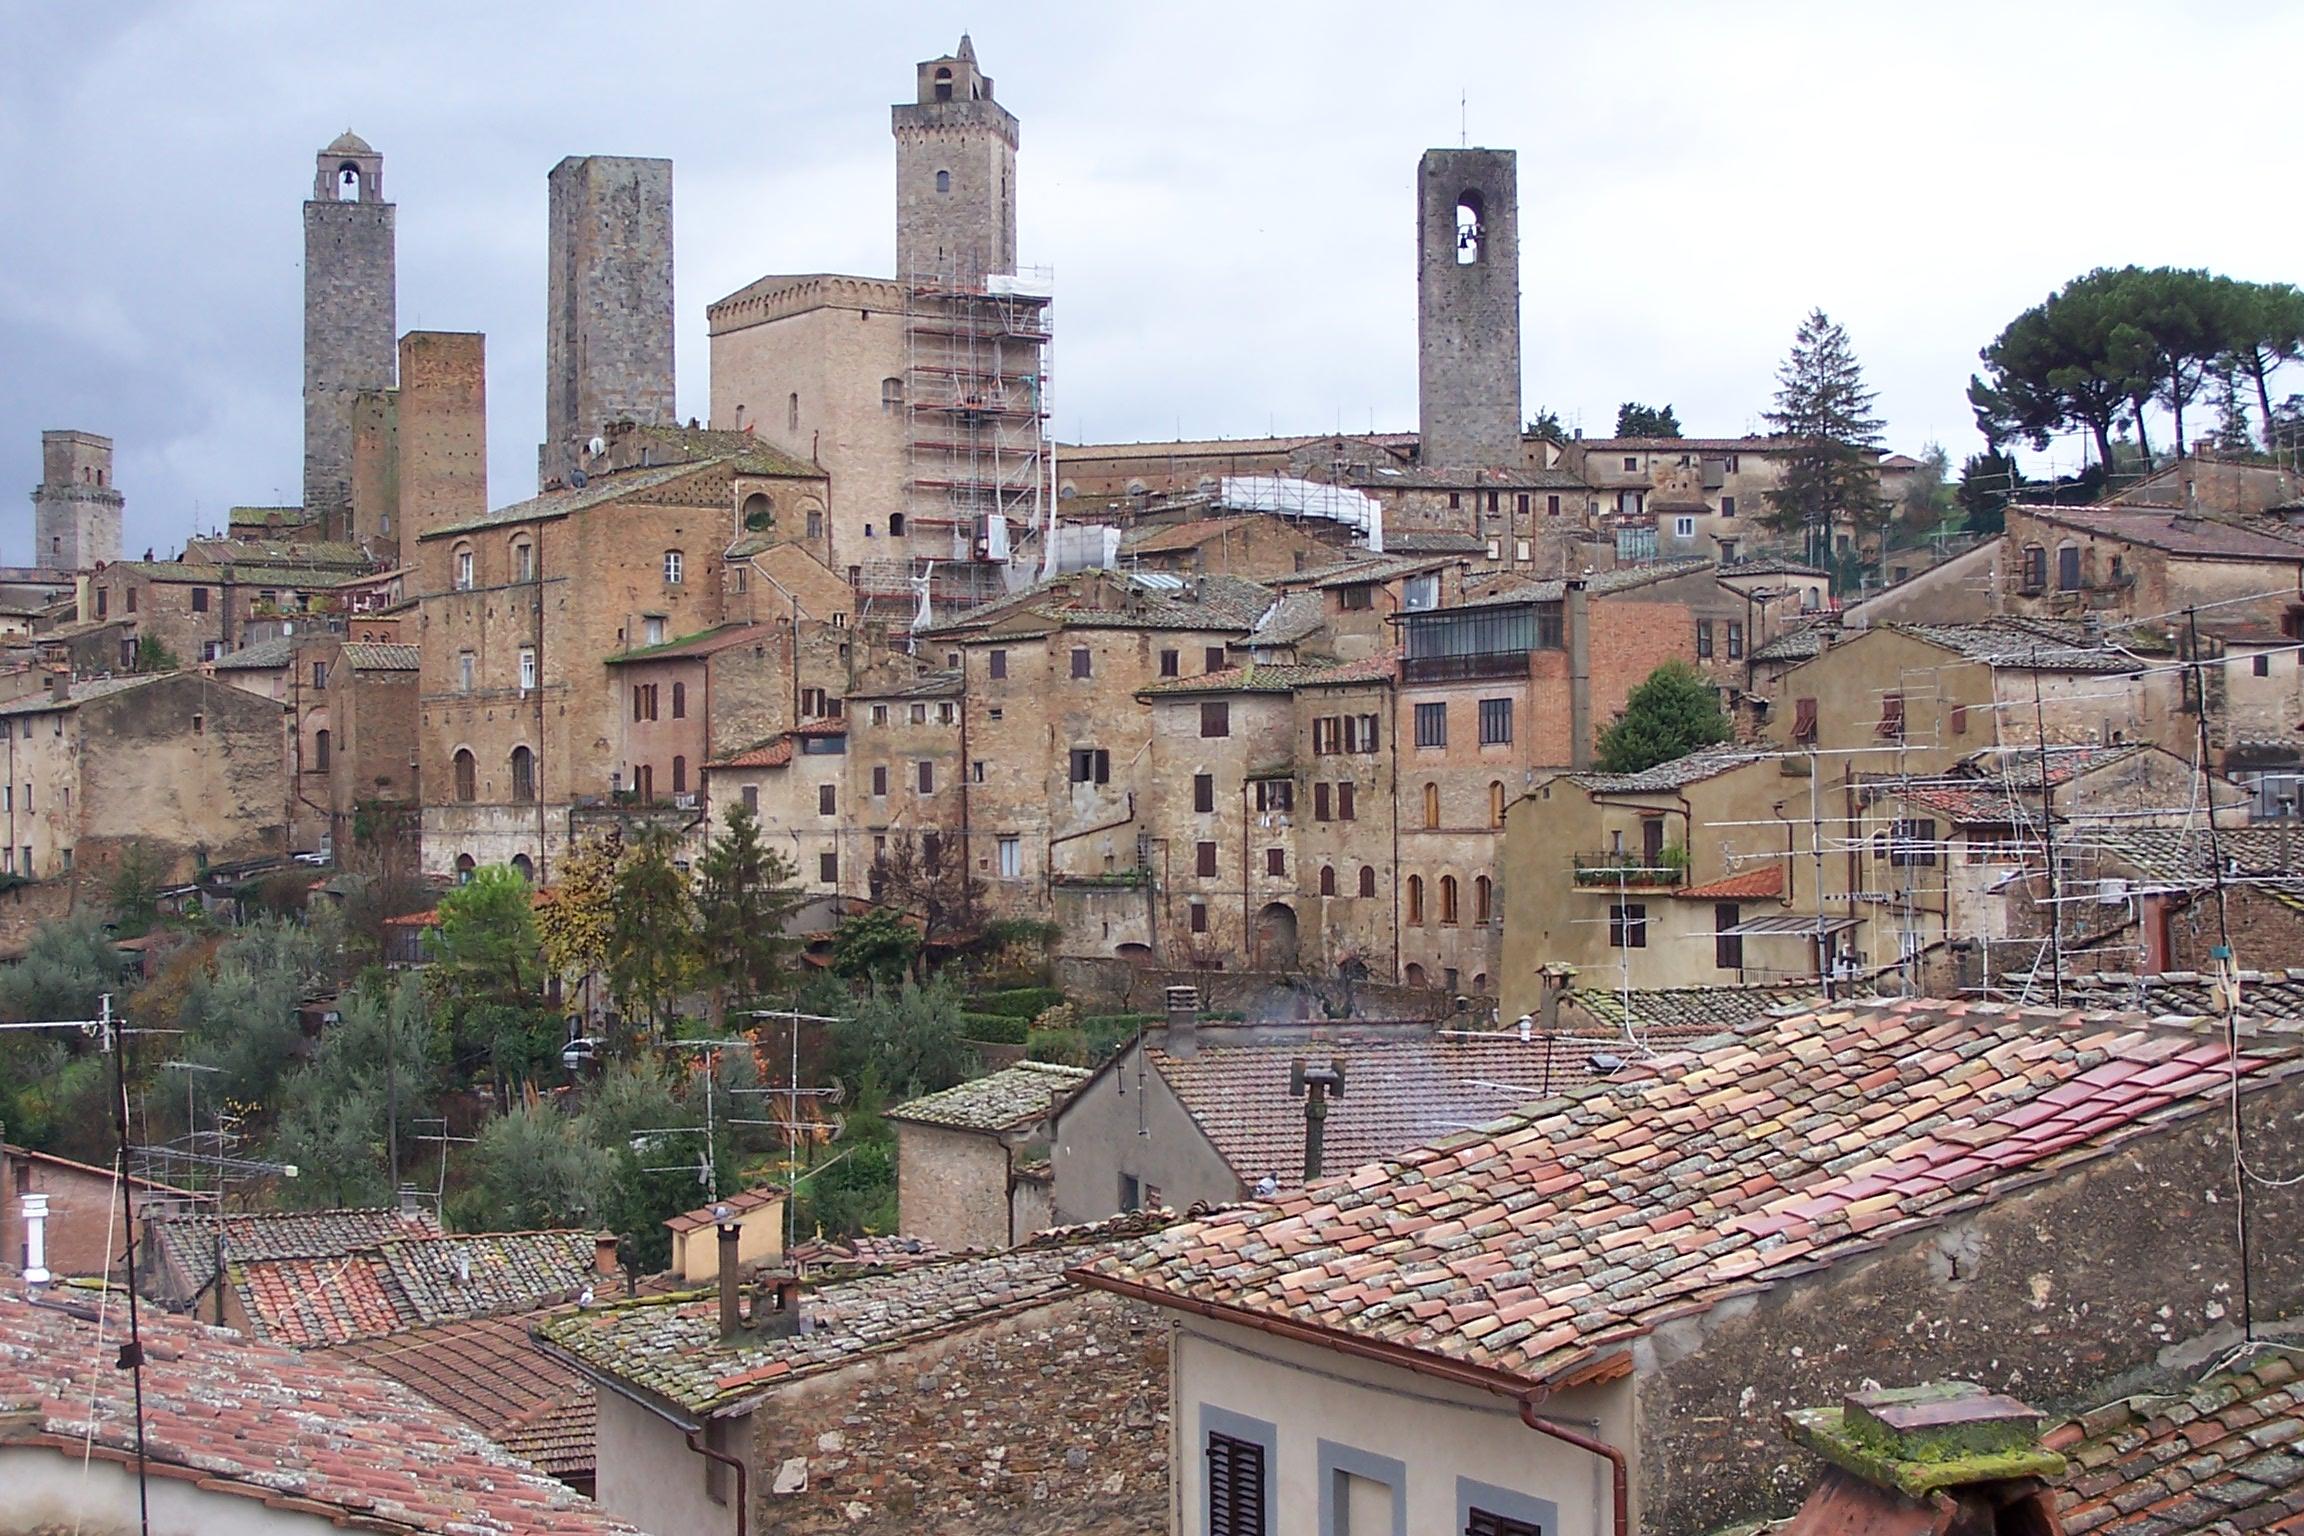 San_Gimignano_torri_1